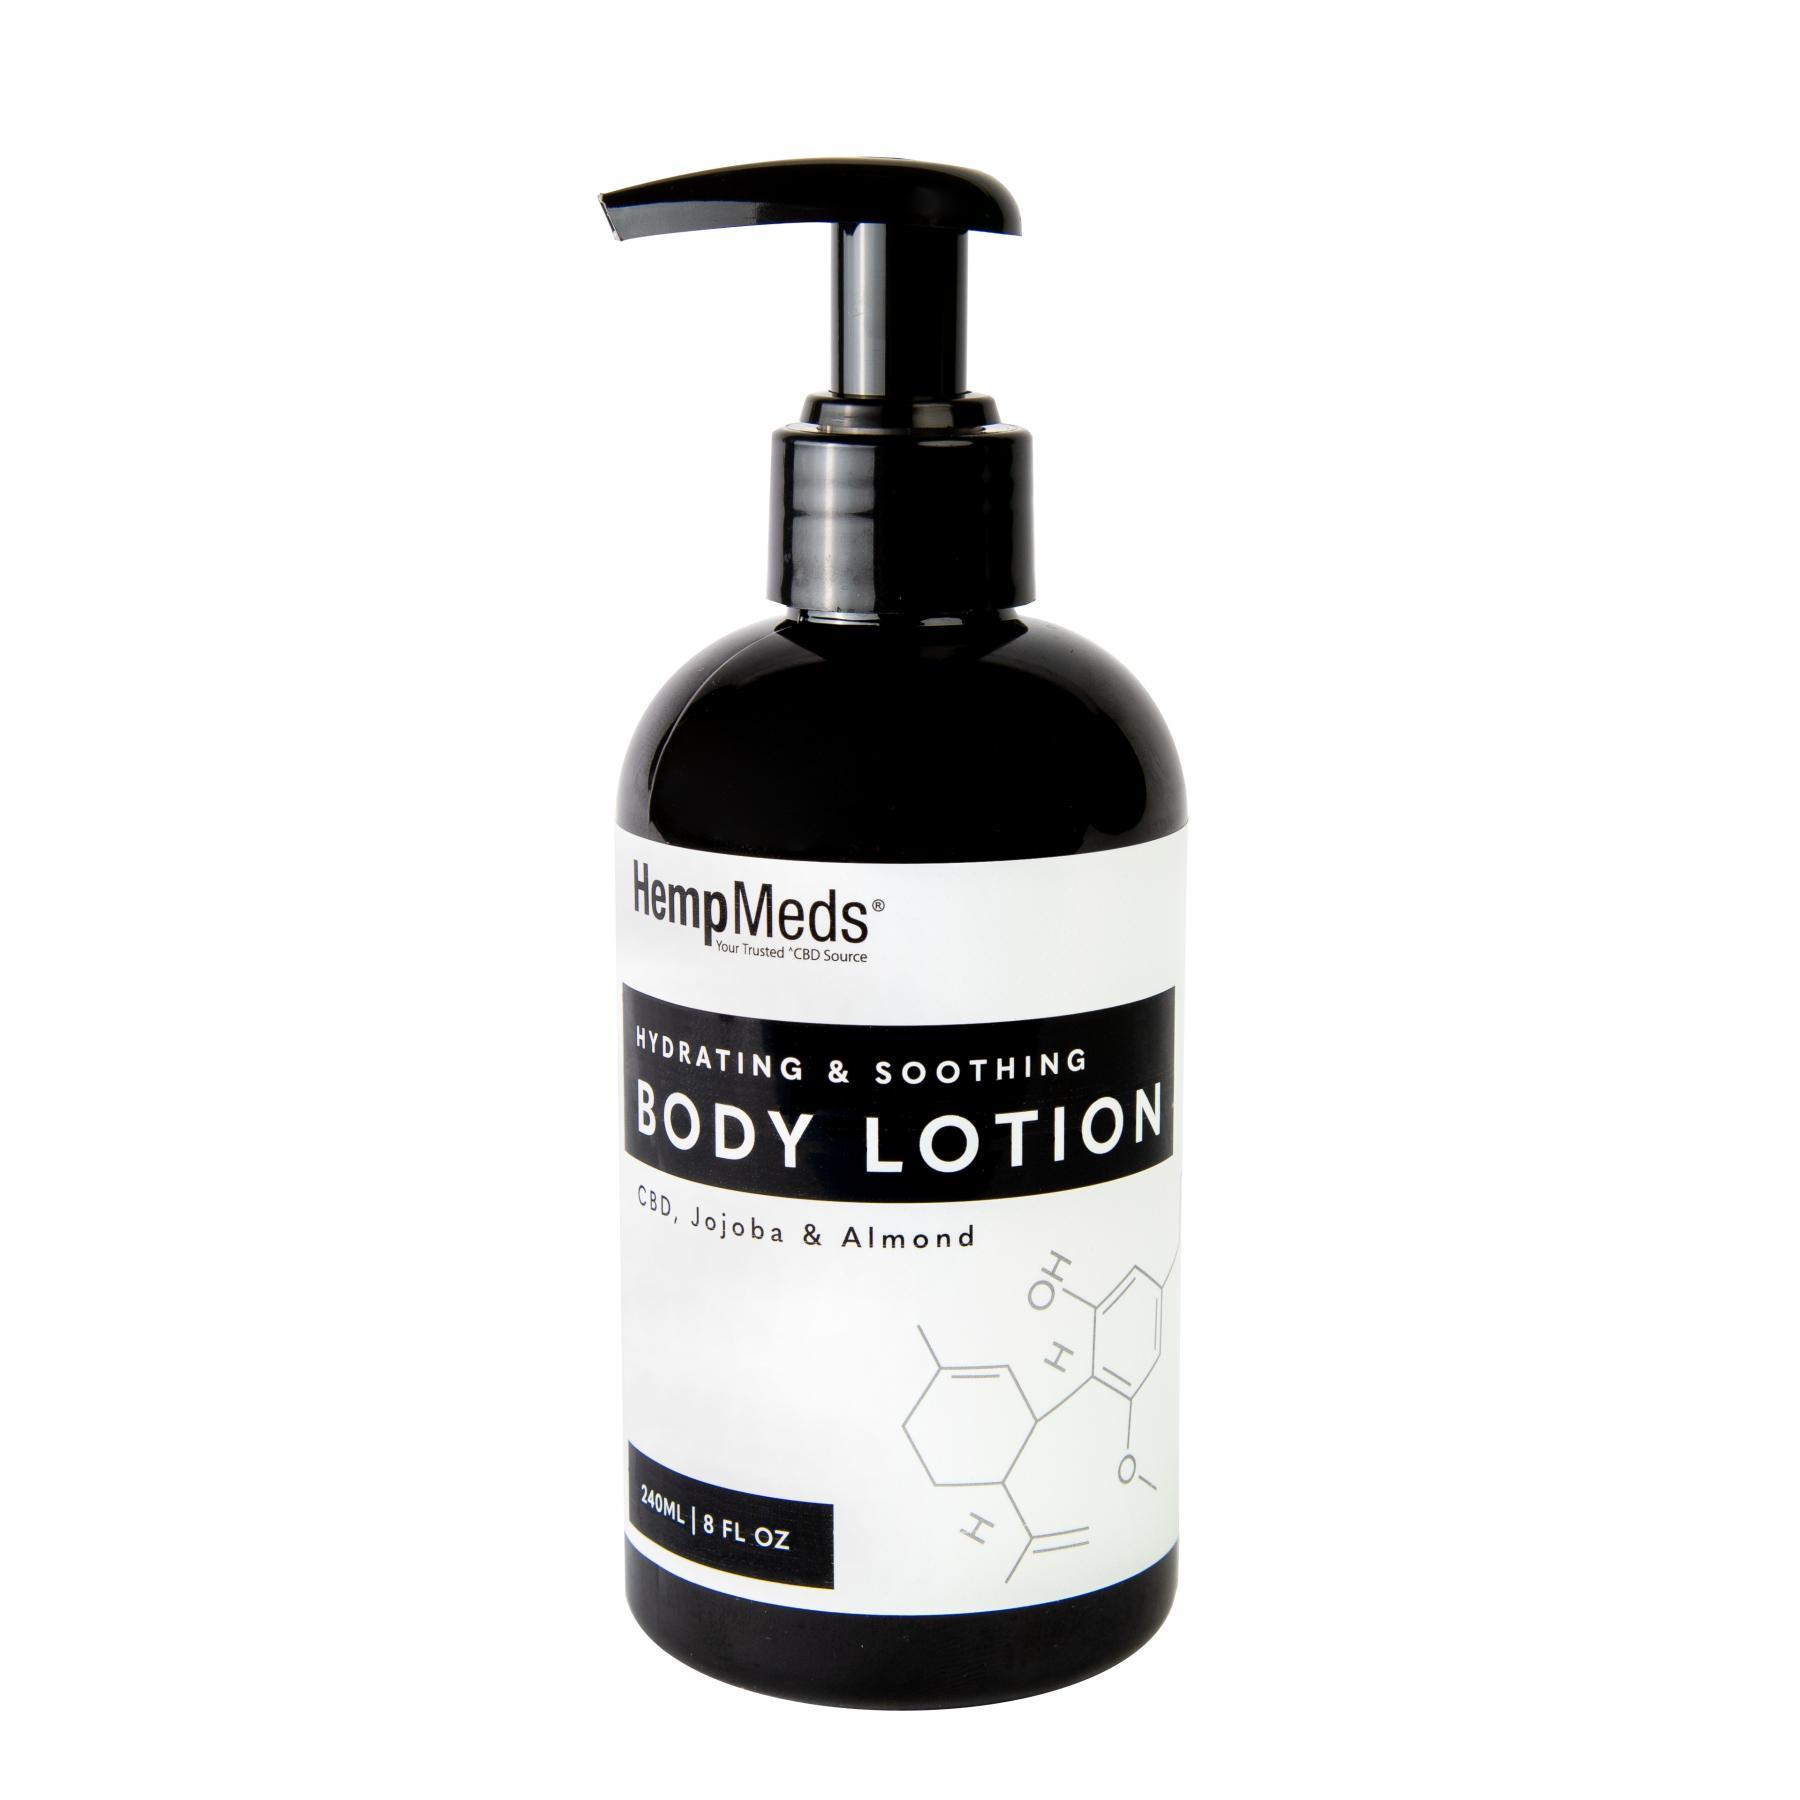 HempMeds® Hydrating & Soothing Body Lotion